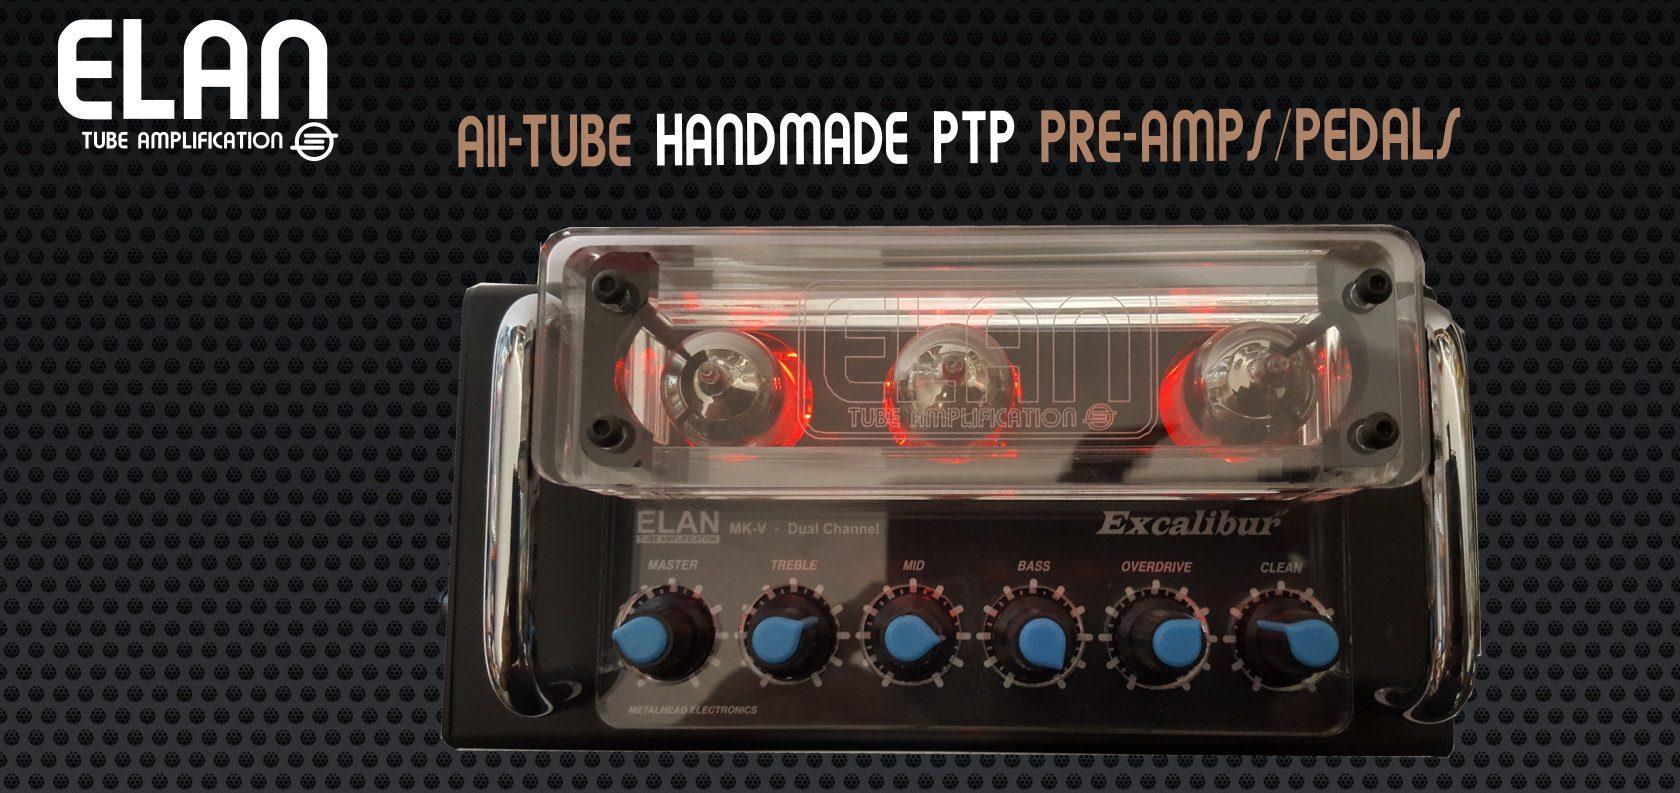 ELAN Tube Amplification- All-Tube Professional Guitar Gear